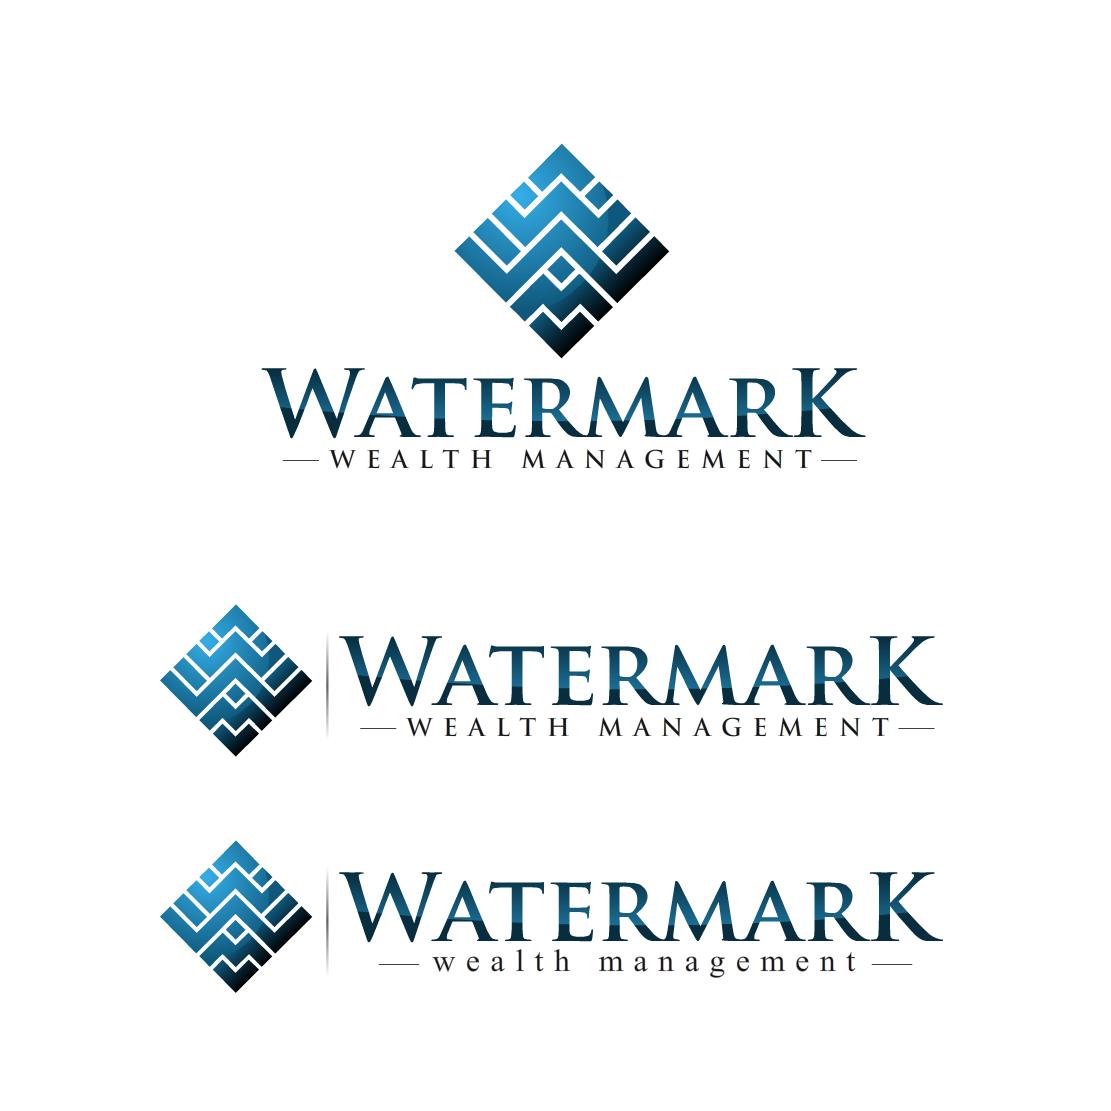 logo for Watermark Wealth Management